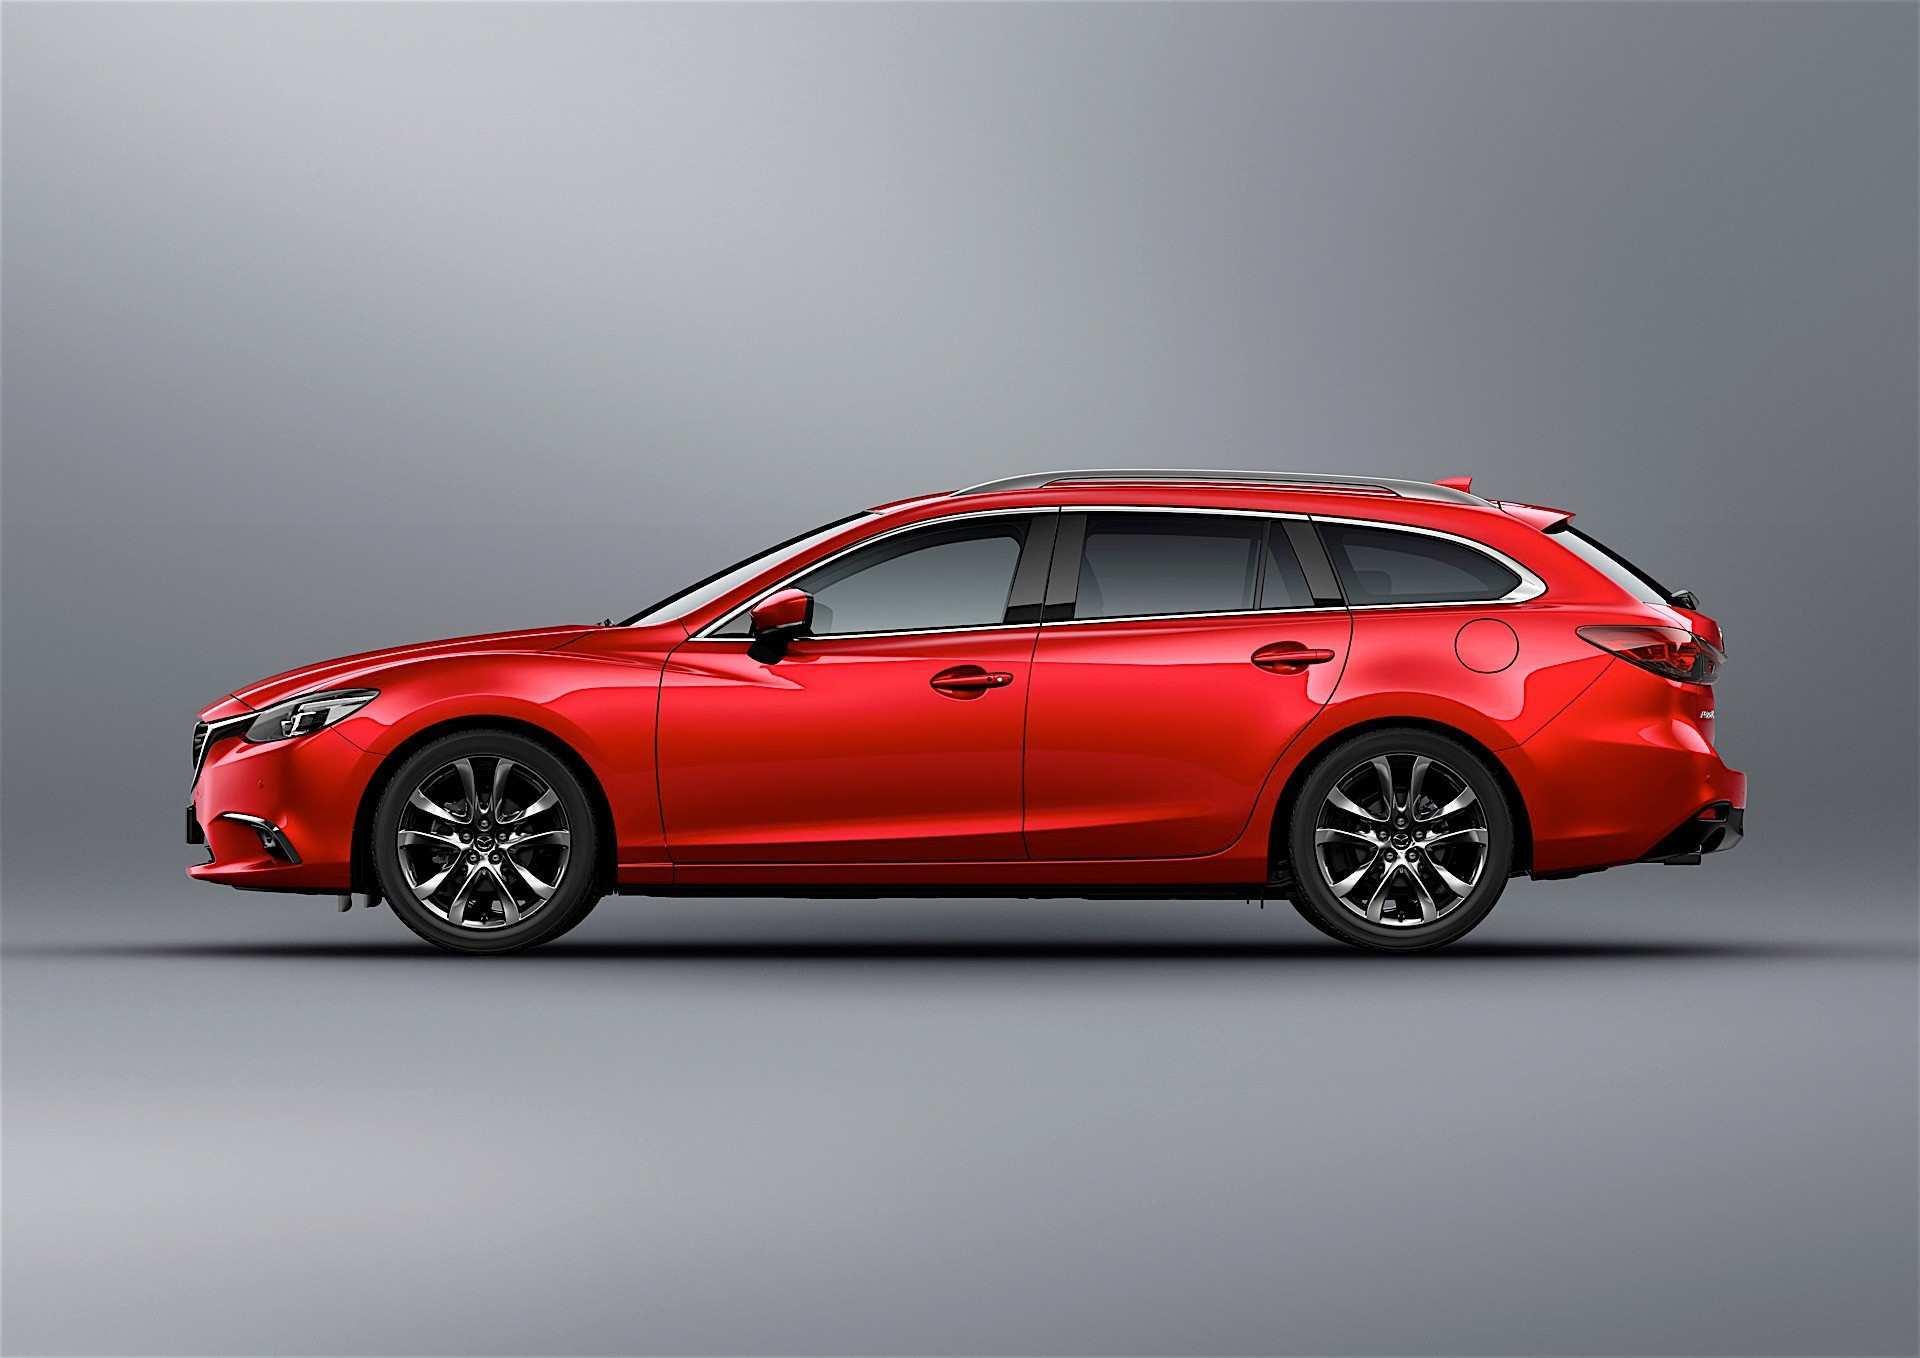 17 Best Review 2020 Mazda 6 Hatchback Photos by 2020 Mazda 6 Hatchback